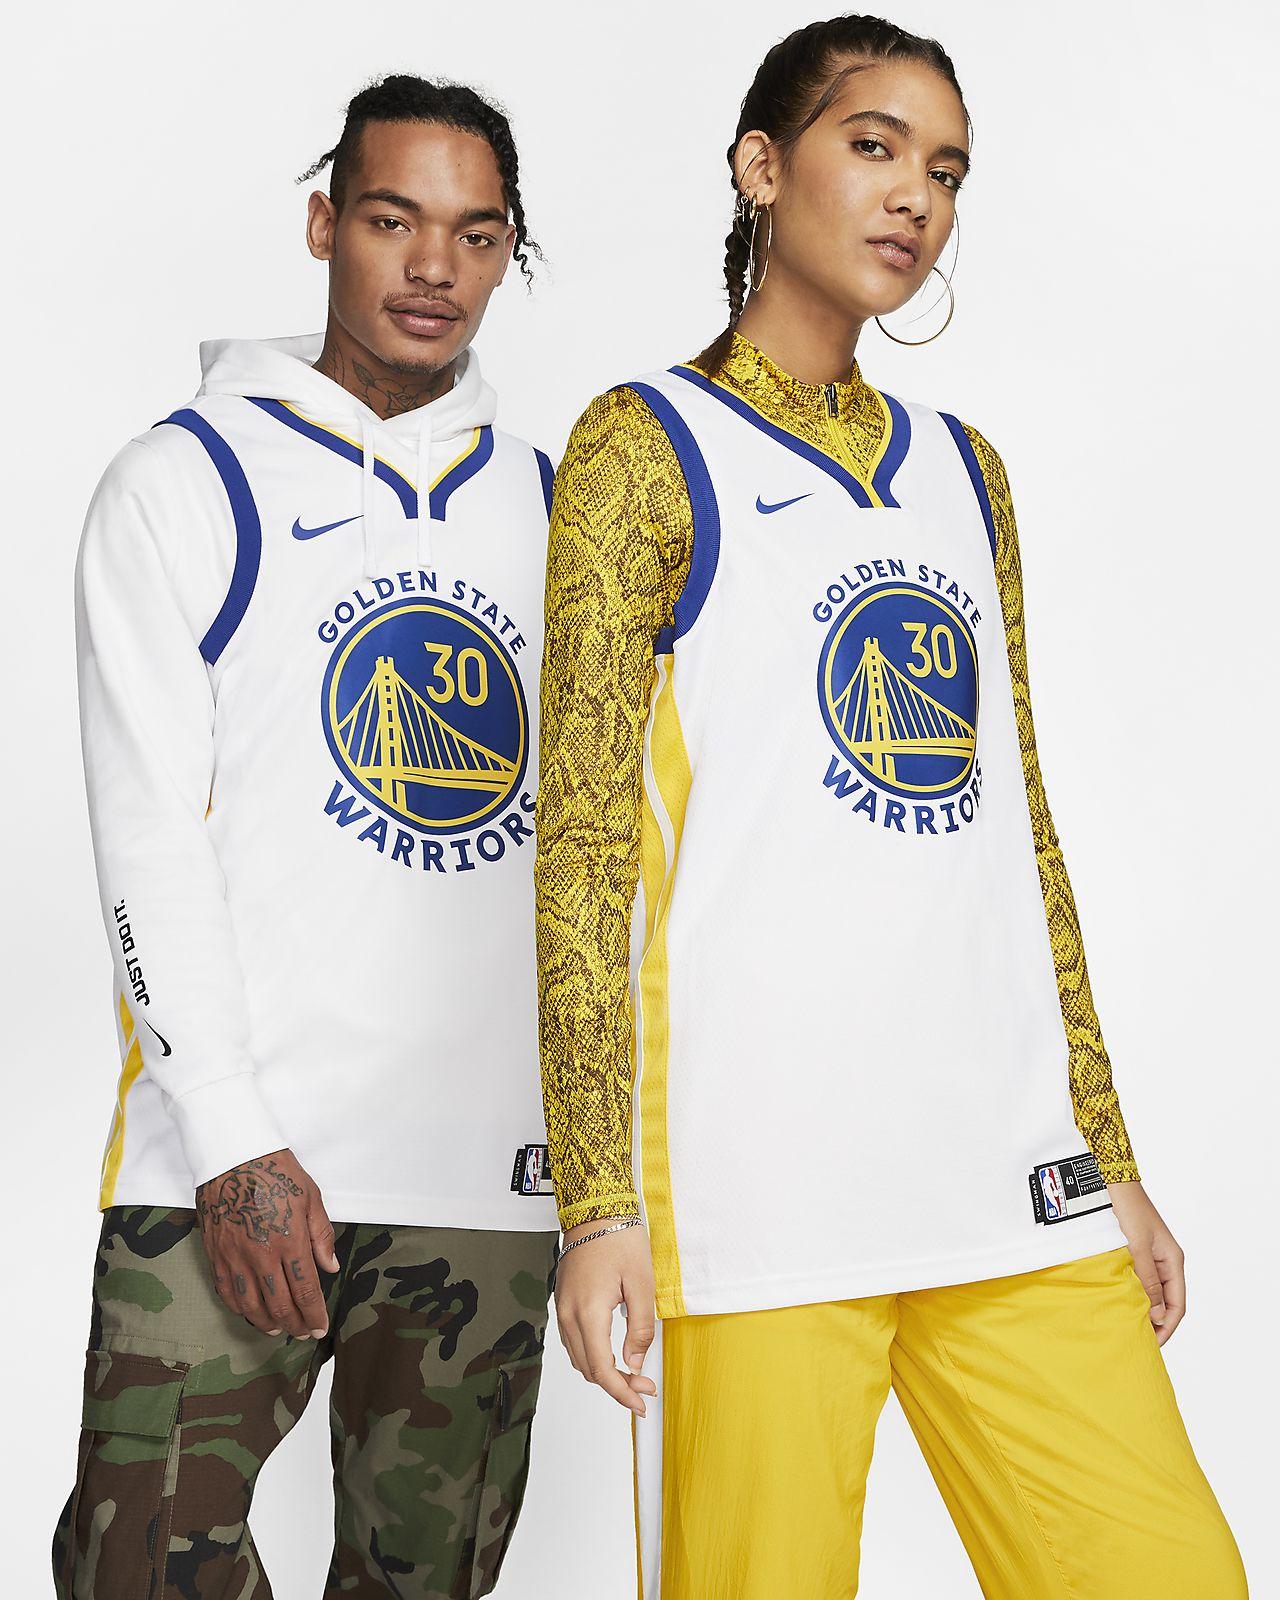 Camiseta Nike NBA Swingman Stephen Curry Warriors Association Edition